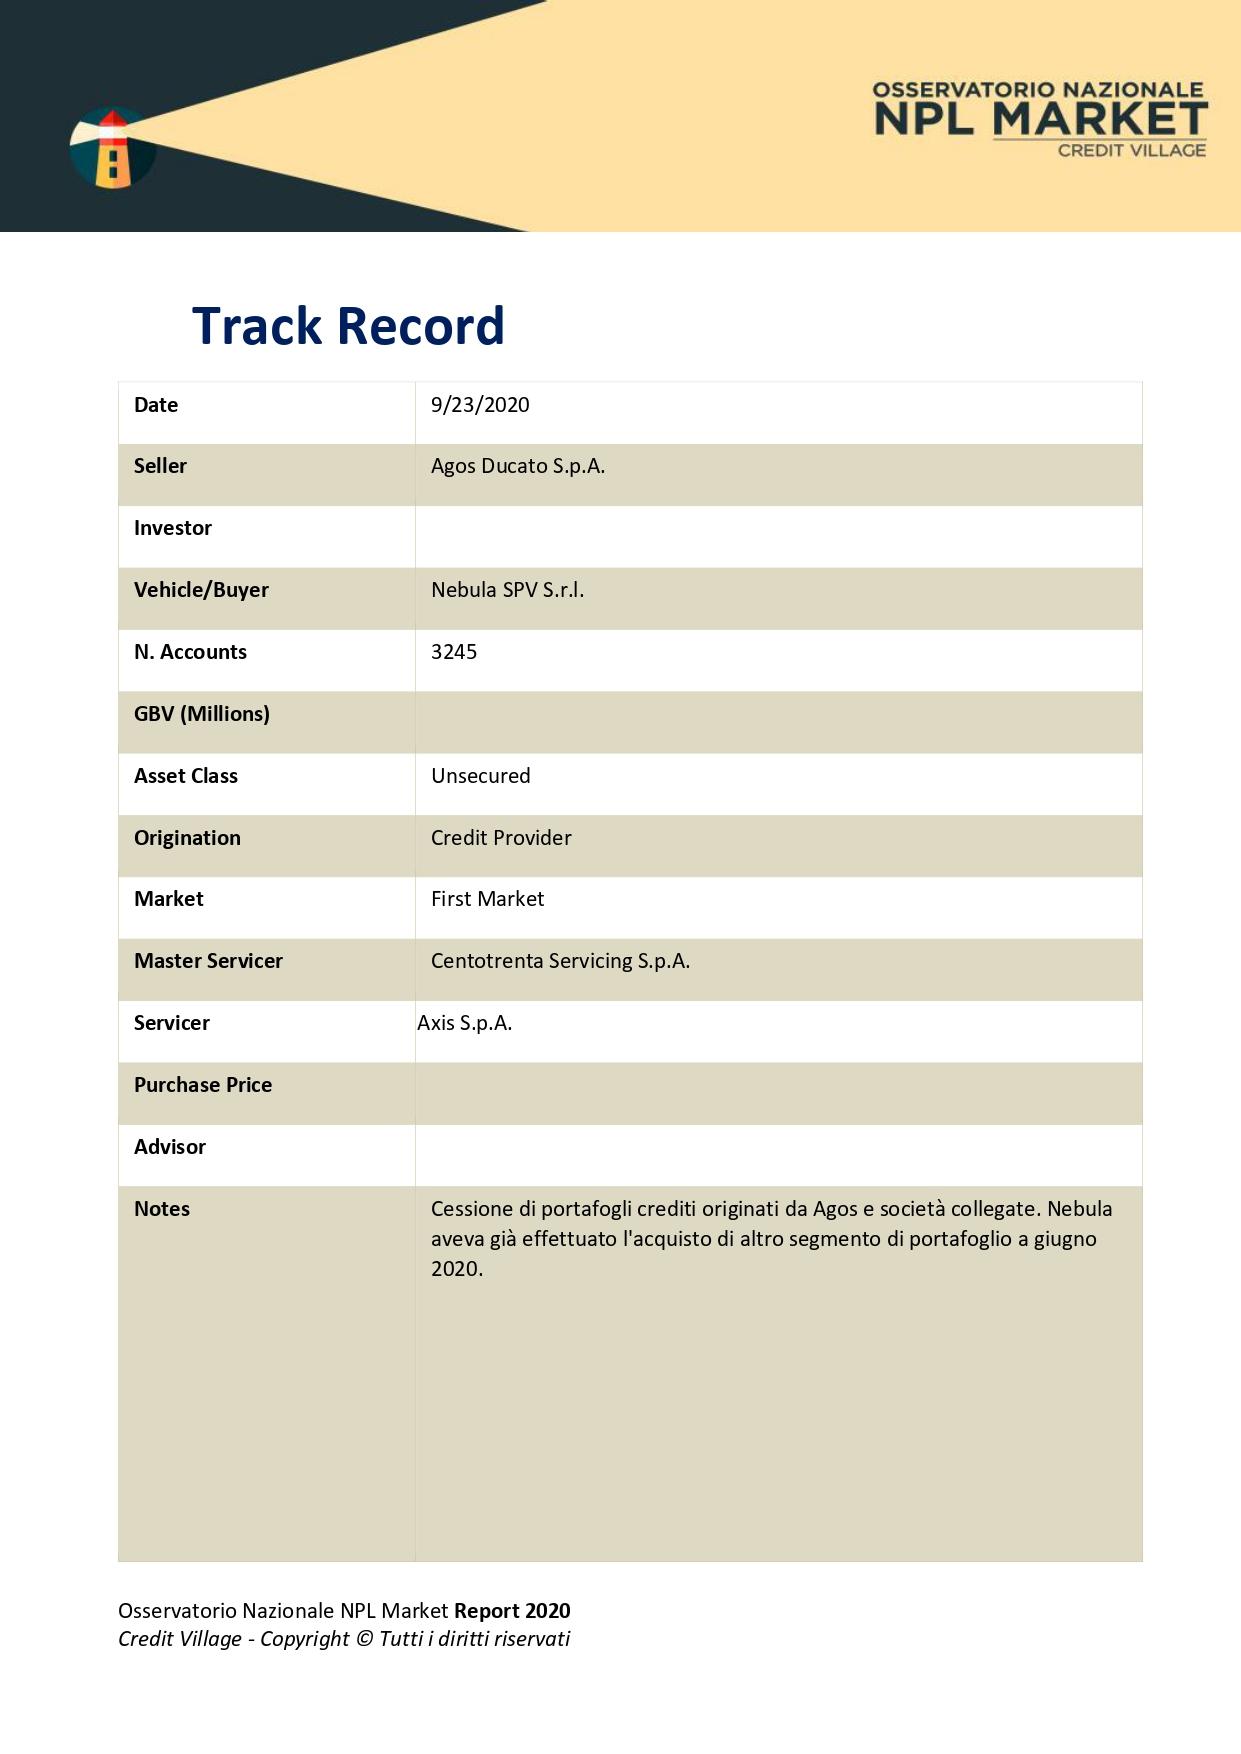 Track-record-5-ottobre_page-0026.jpg